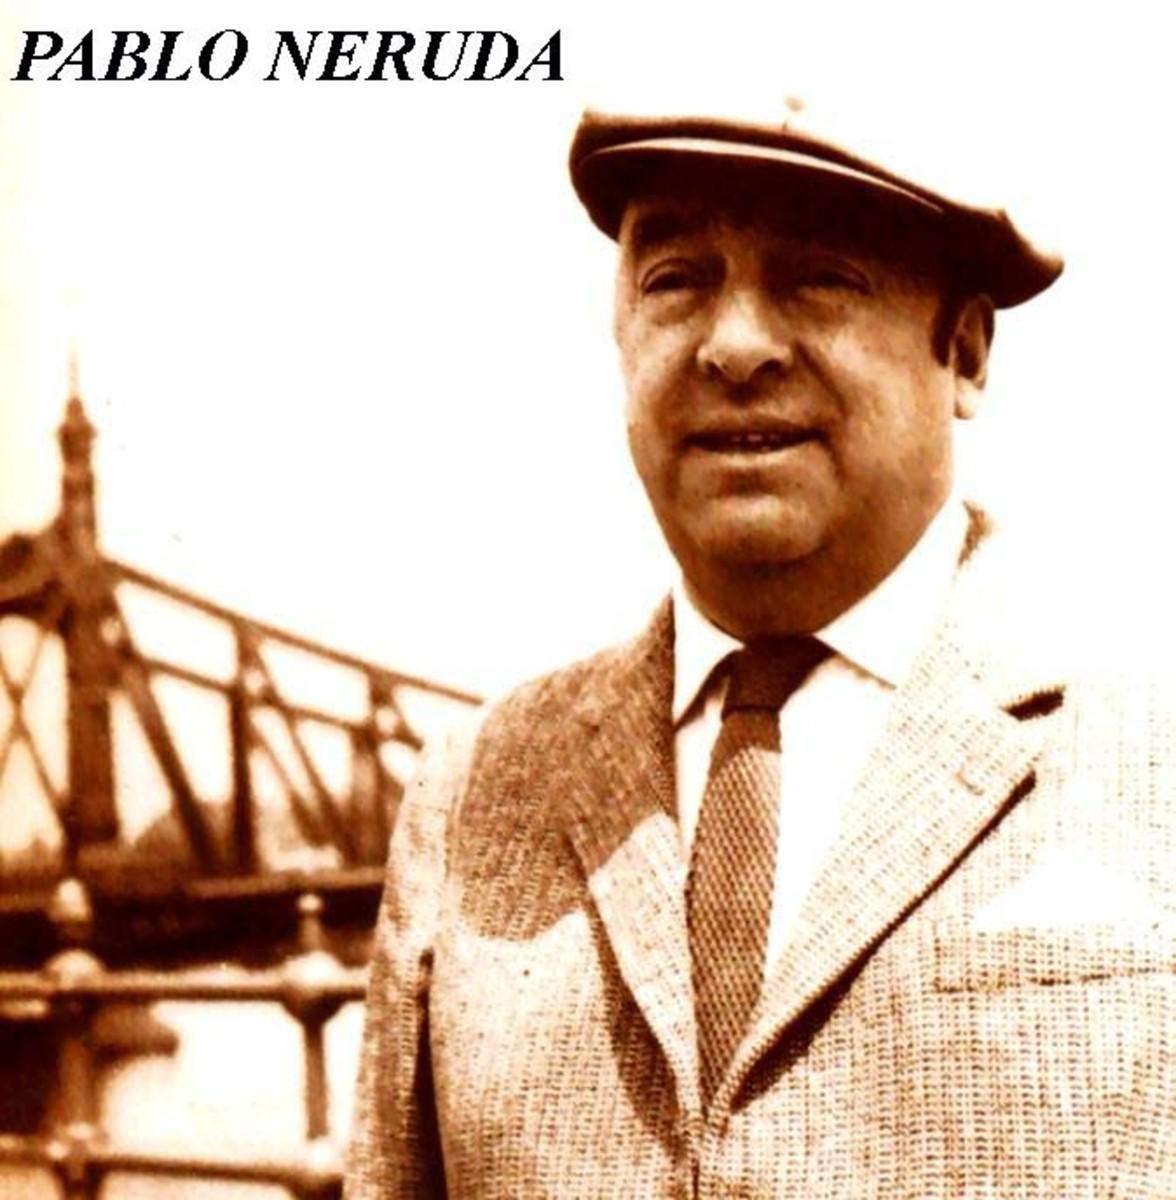 Pablo Neruda: A Great Modern Lyrical Poet